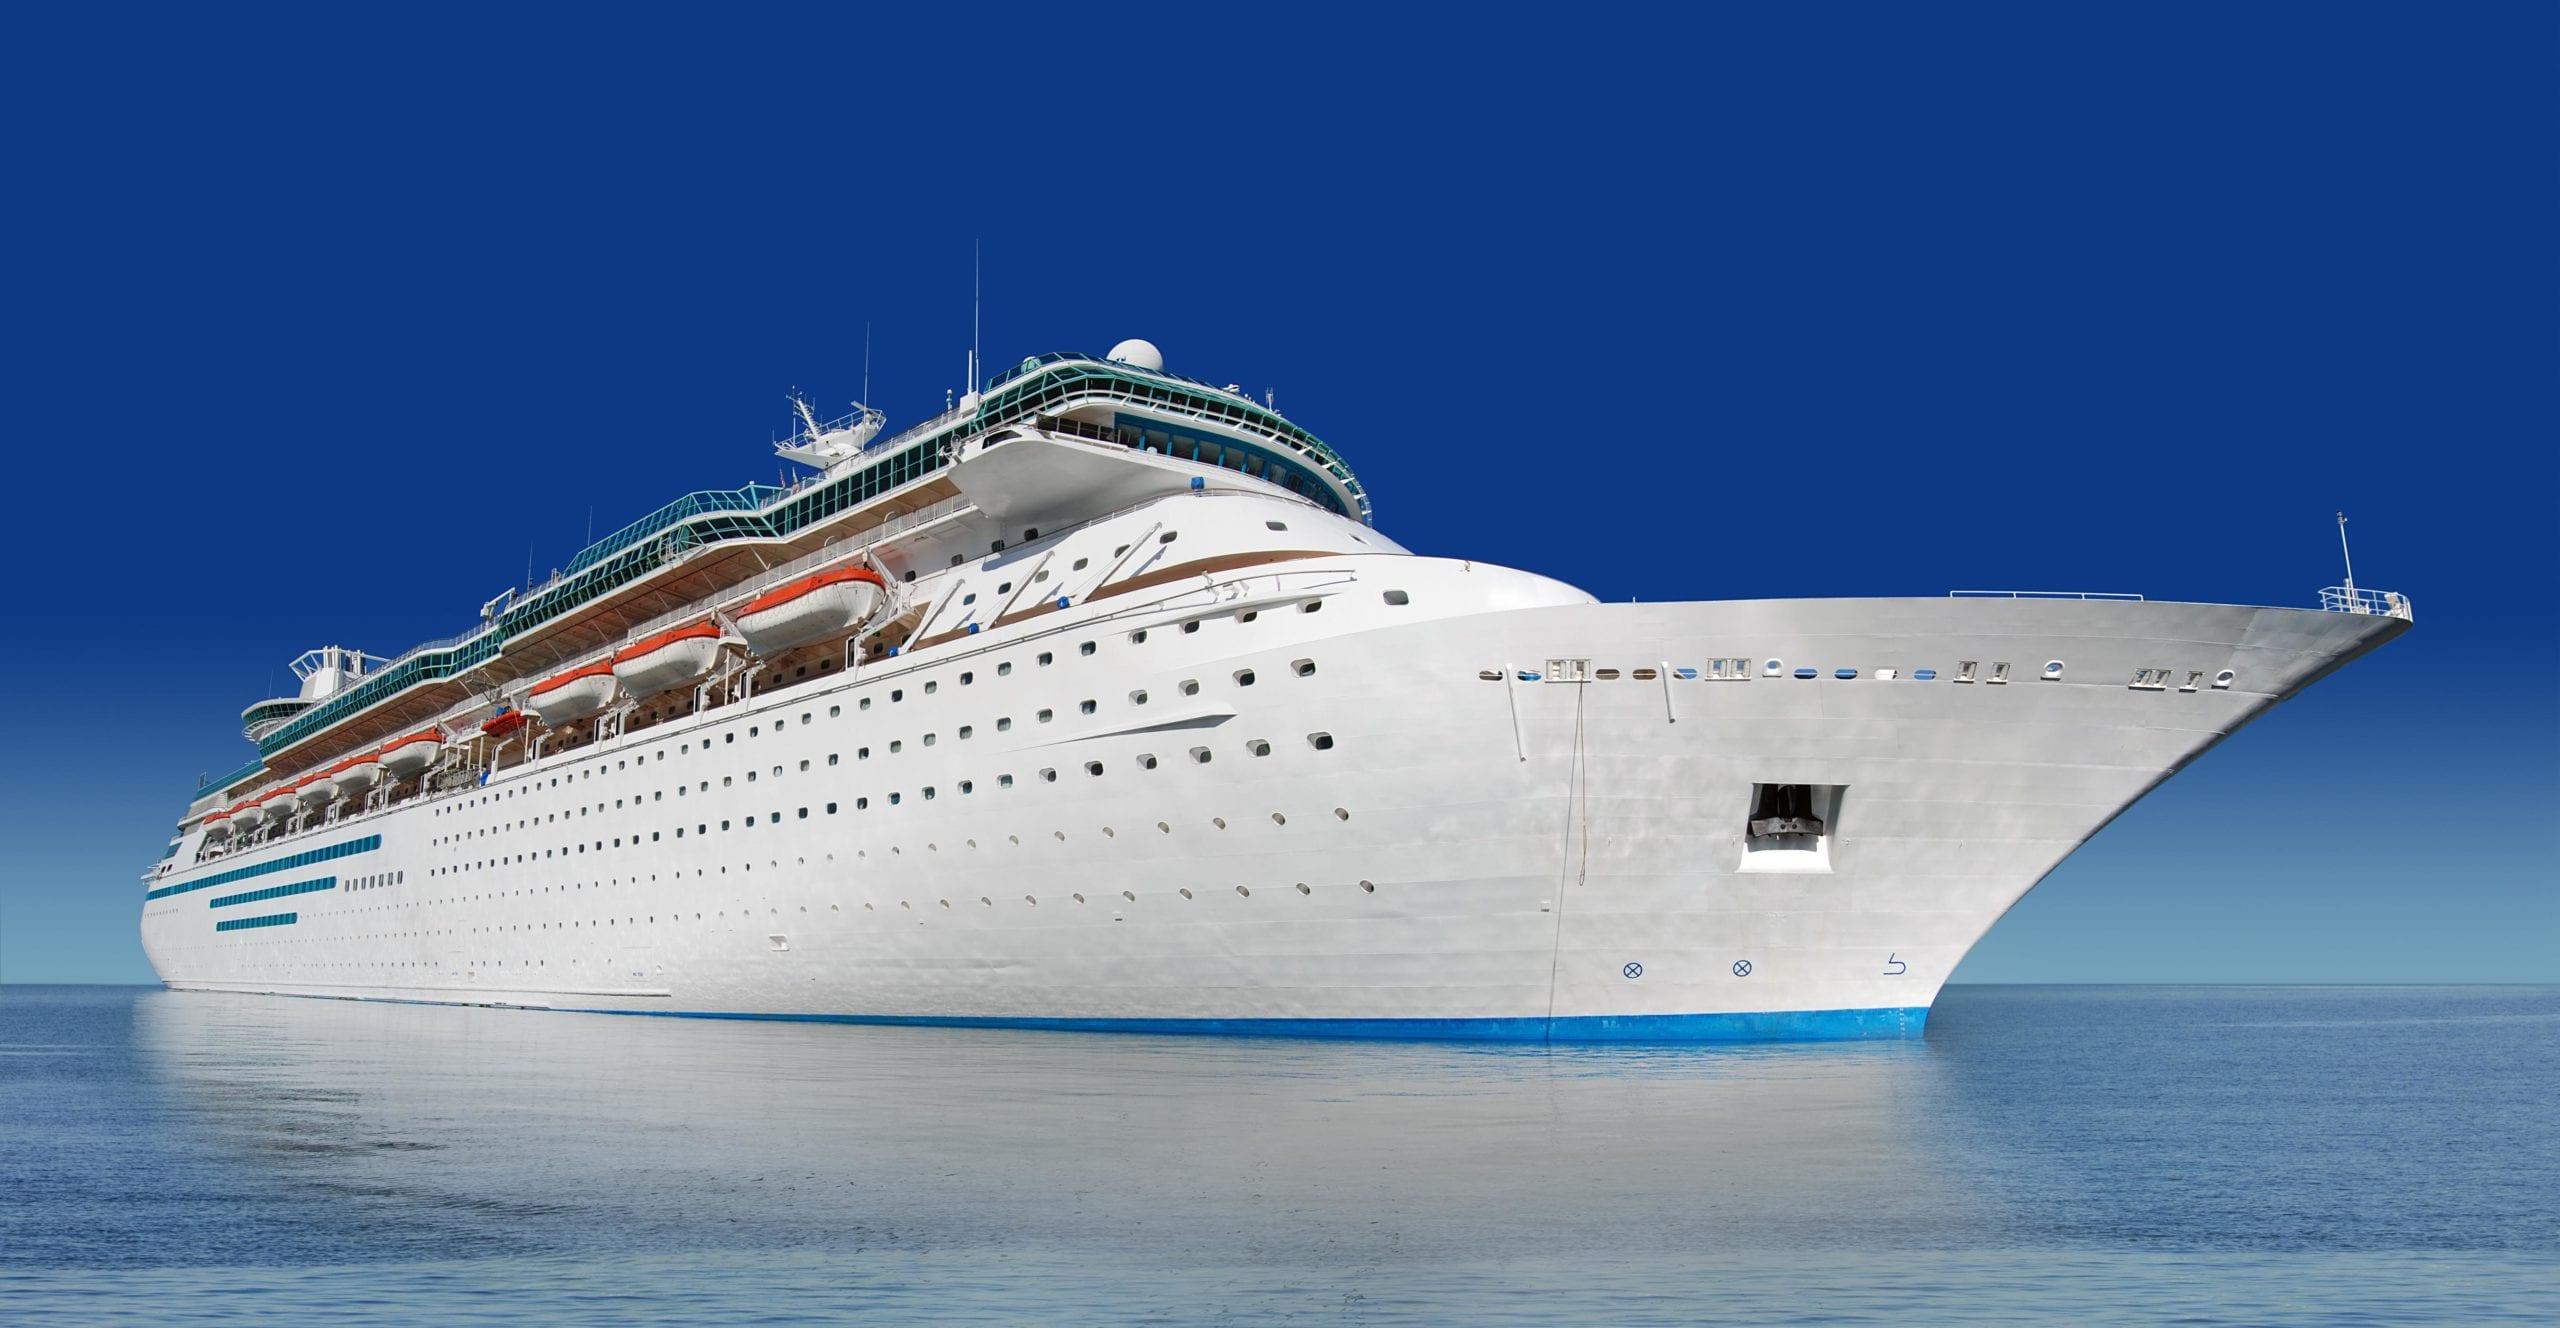 US Ends 'No Sail' Cruise Ship Ban And Cruises Will Resume Before 2021